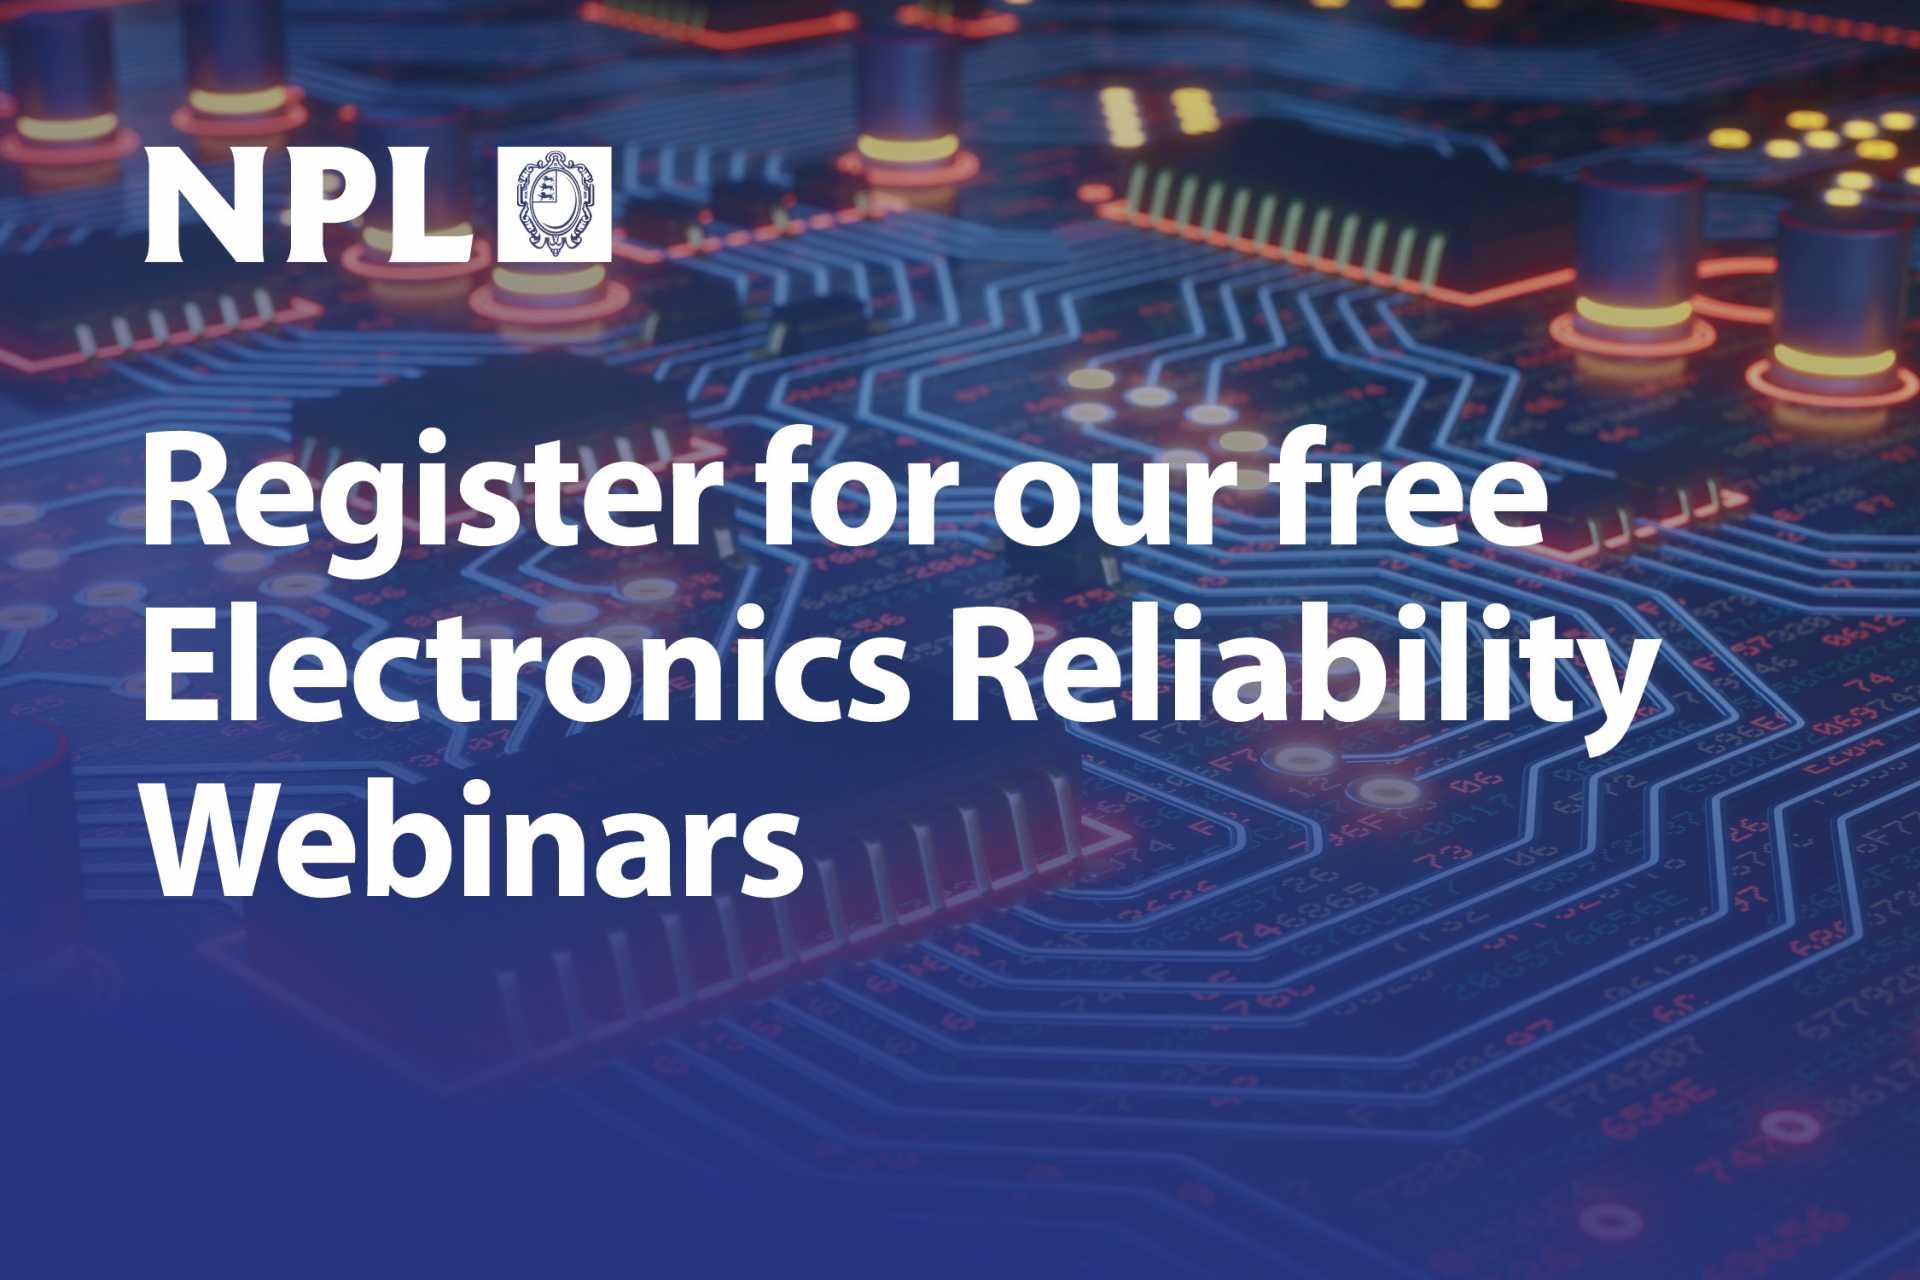 NPL Electronics reliability webinars Advert